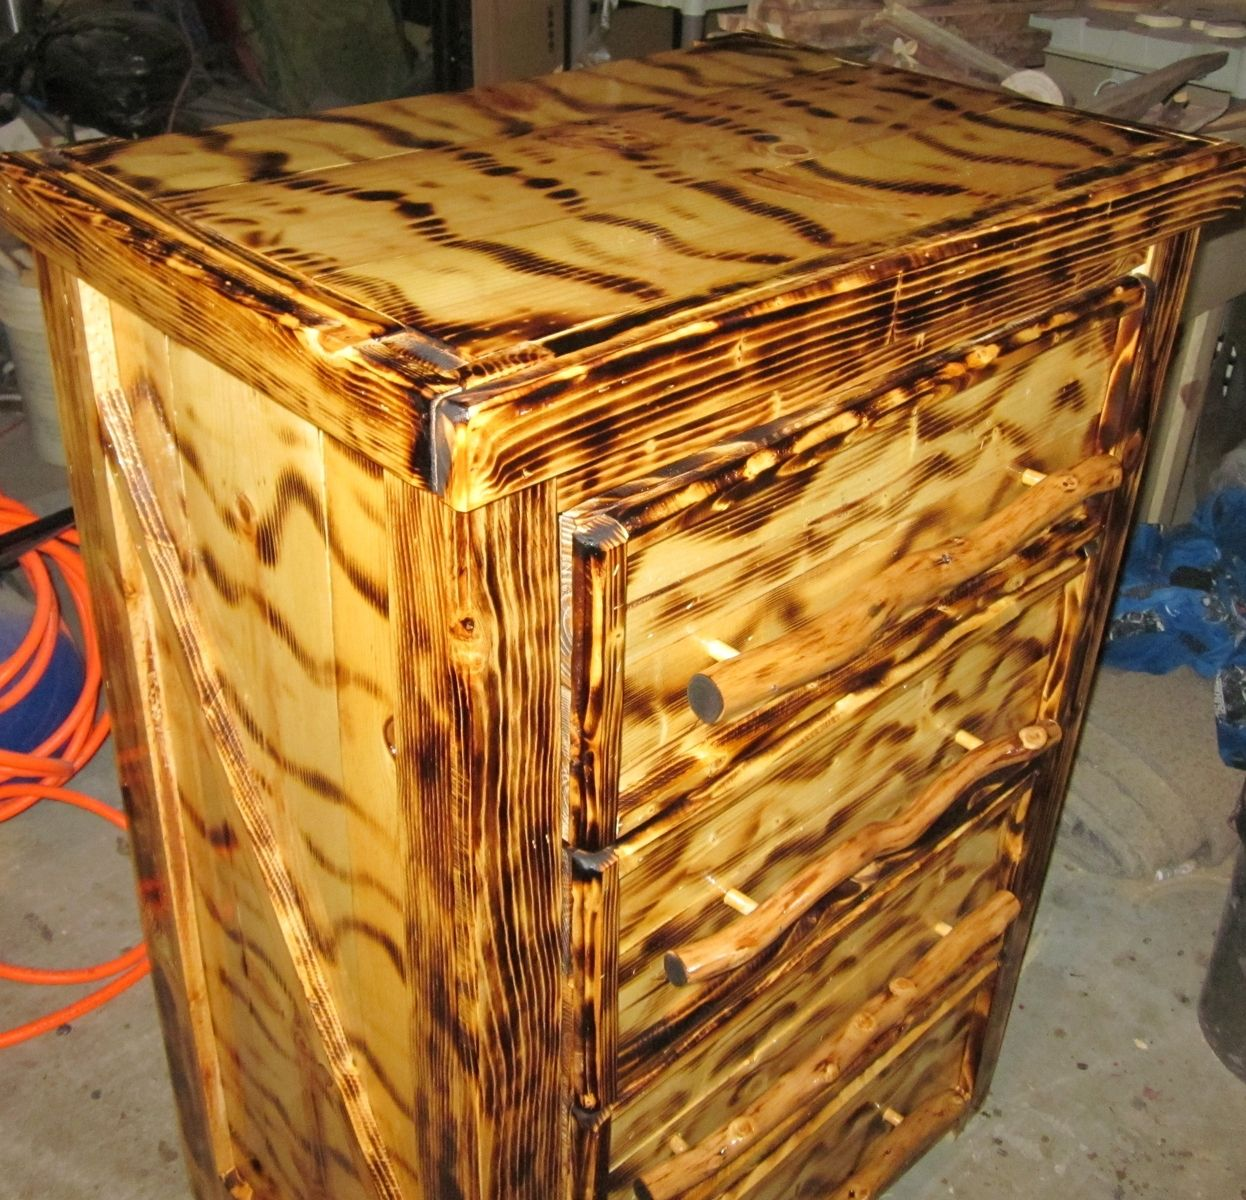 Handmade Rustic Burnt Dresser By Sonoran Sandman